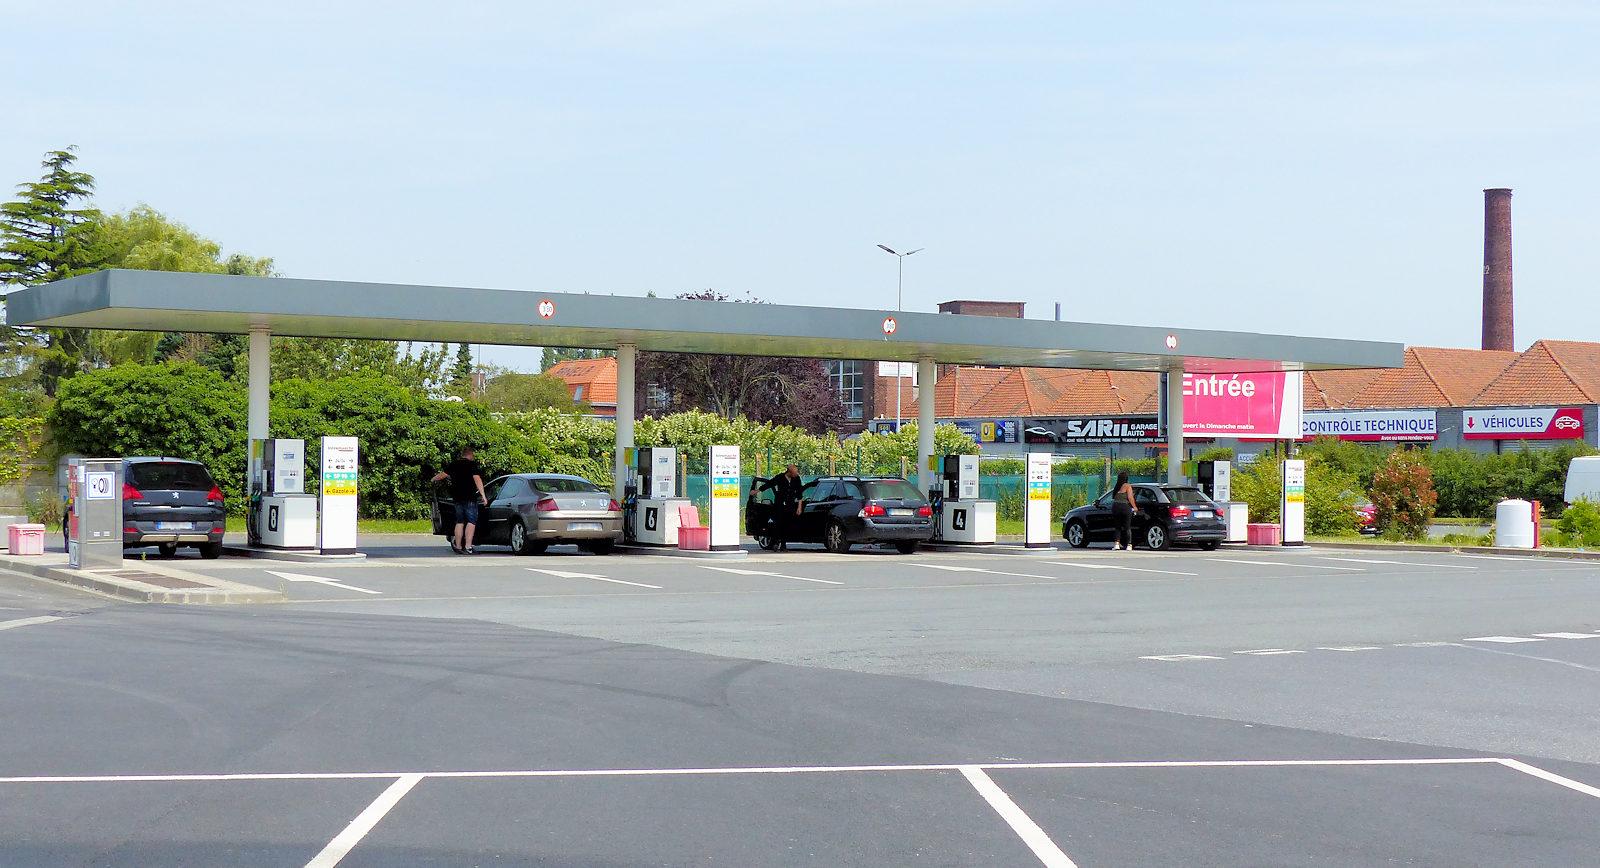 Station Essence - Intermarché Super et Drive, Tourcoing